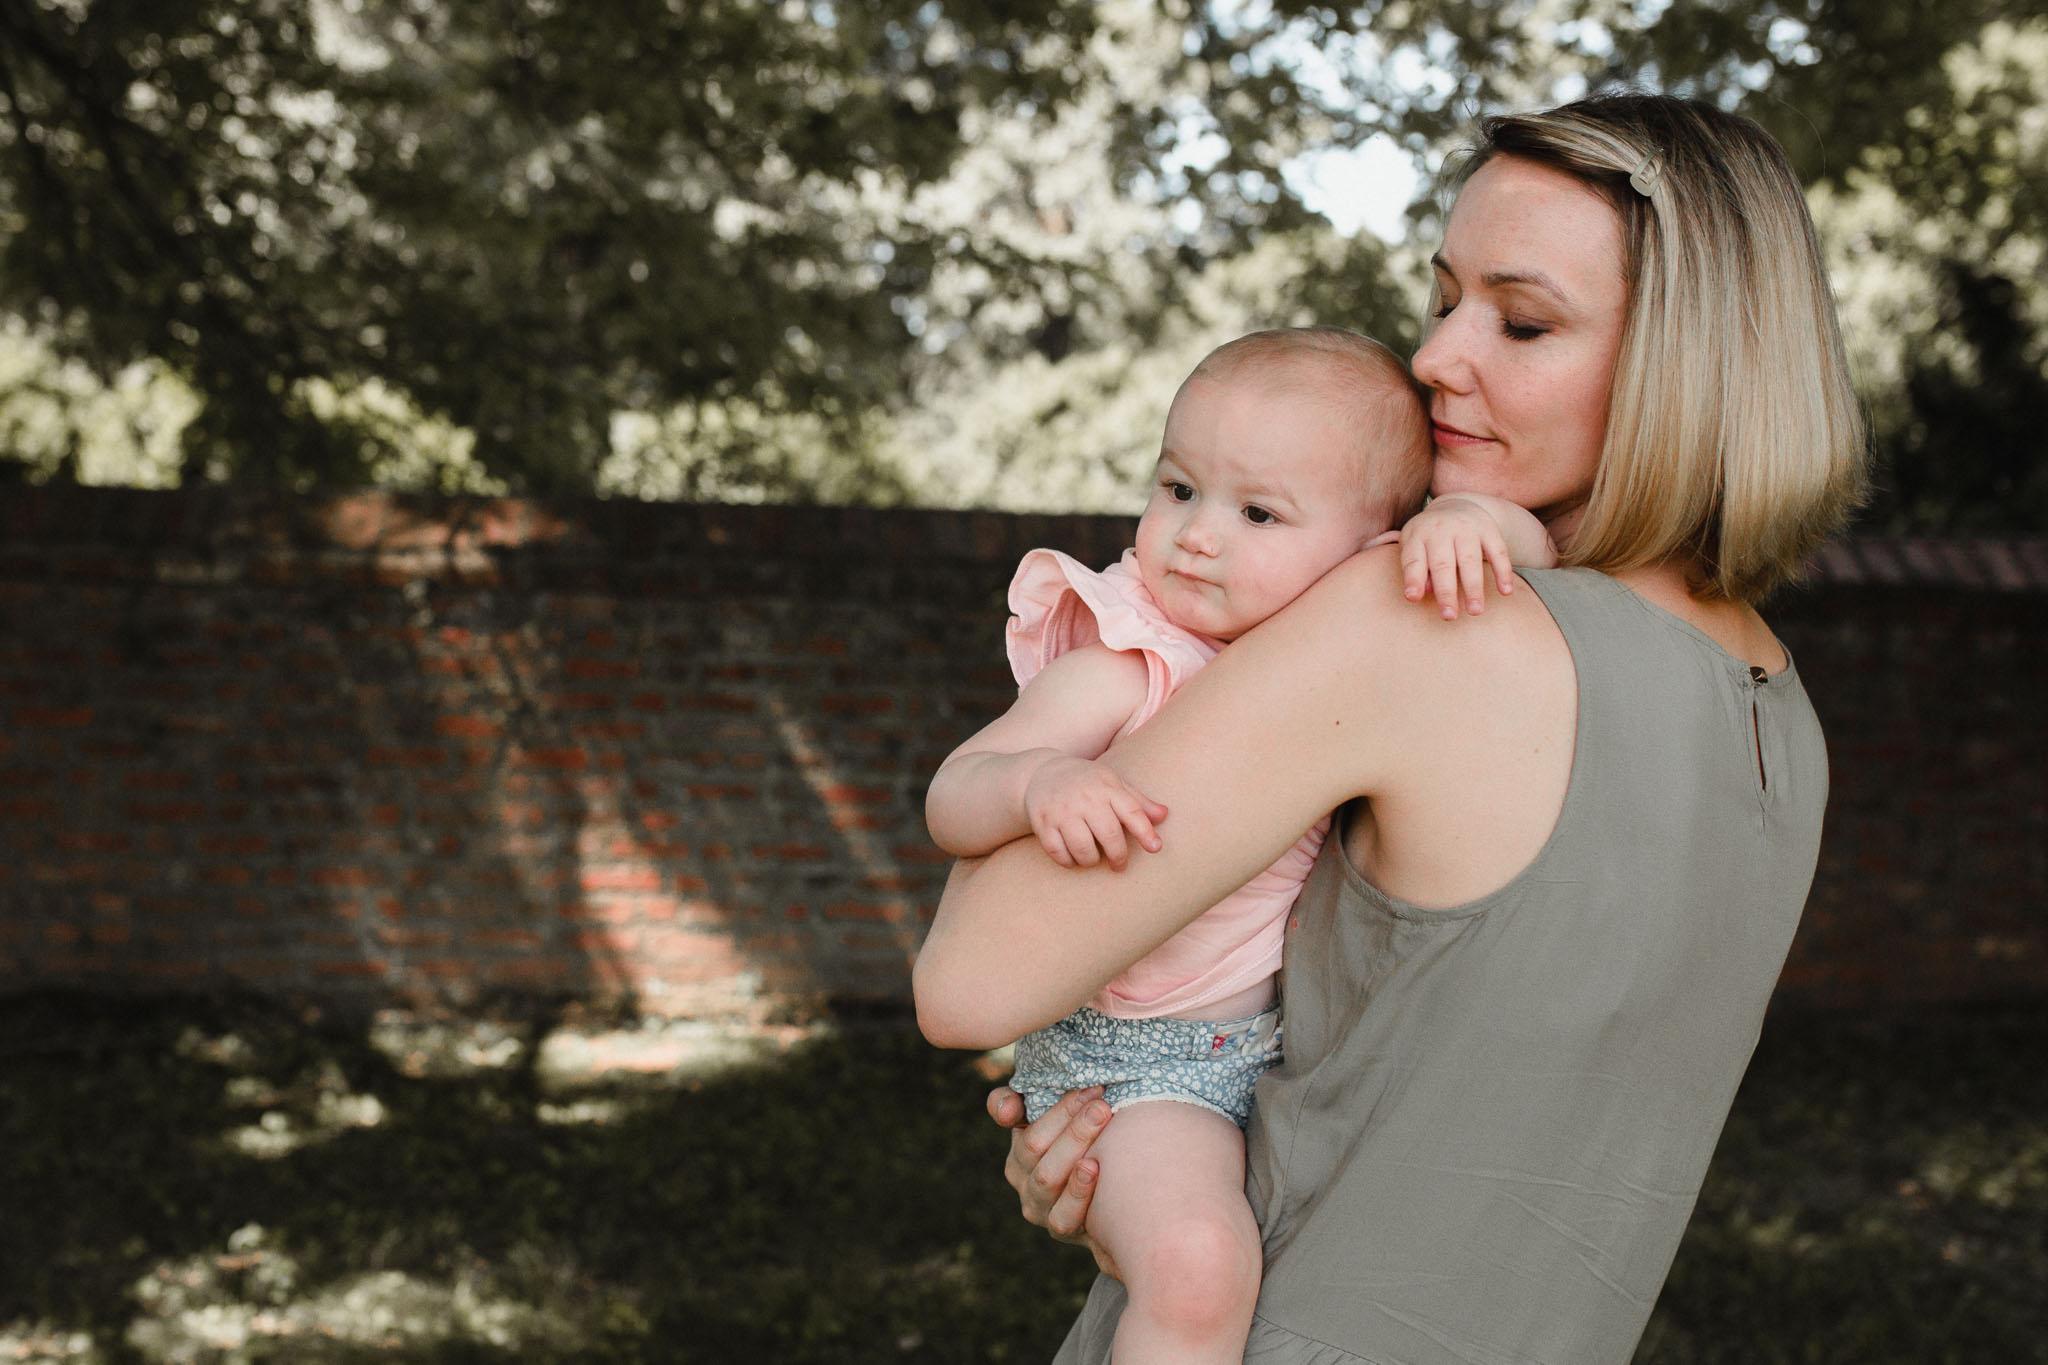 Mom closing her eyes holding her infant daughter at Morven Park in Leesburg, Virginia